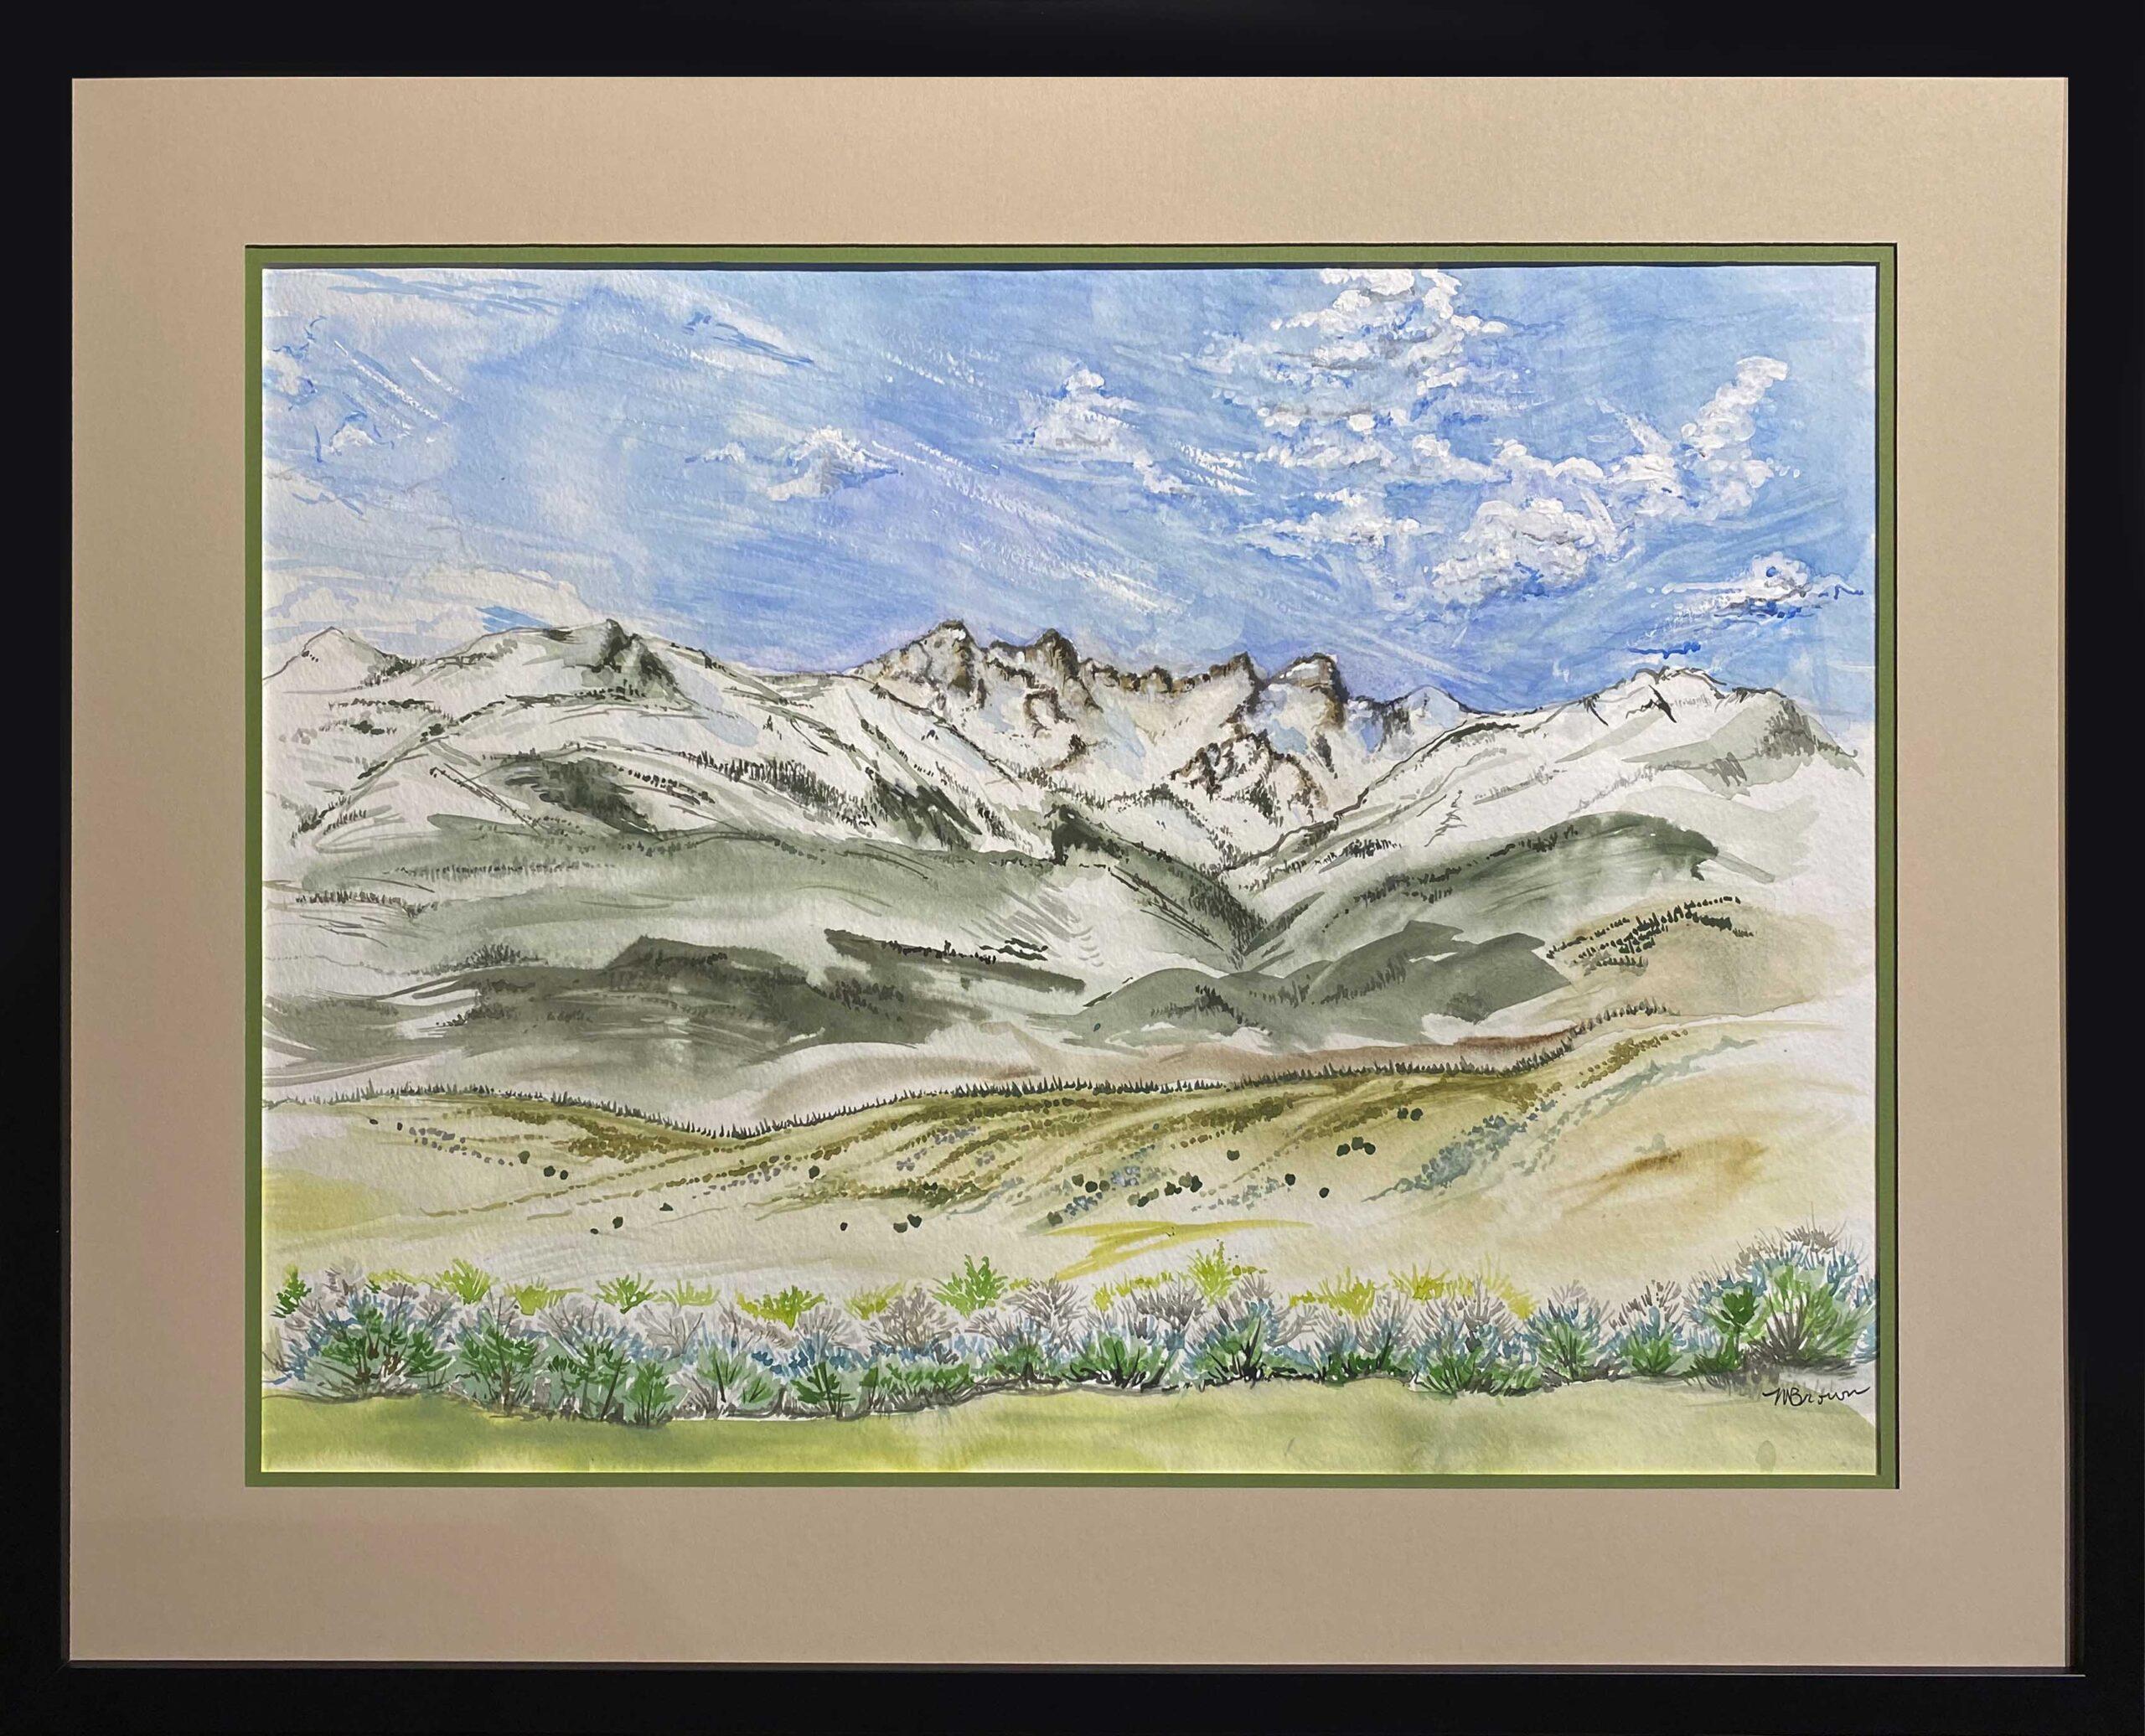 Sawtooth Ridge